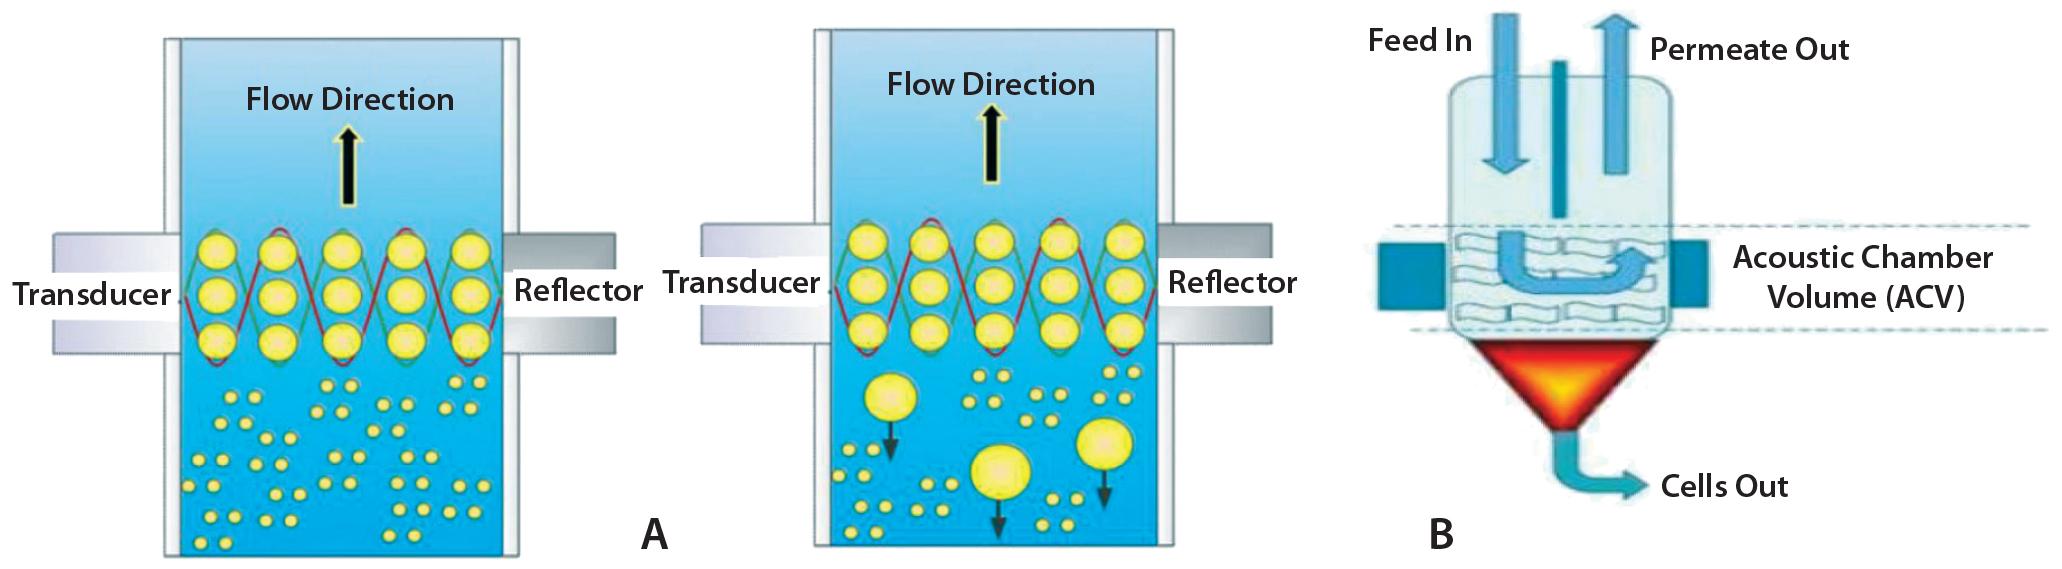 Case Study: Depth-Filter Turbidity Recoveries - Single-Use Harvest